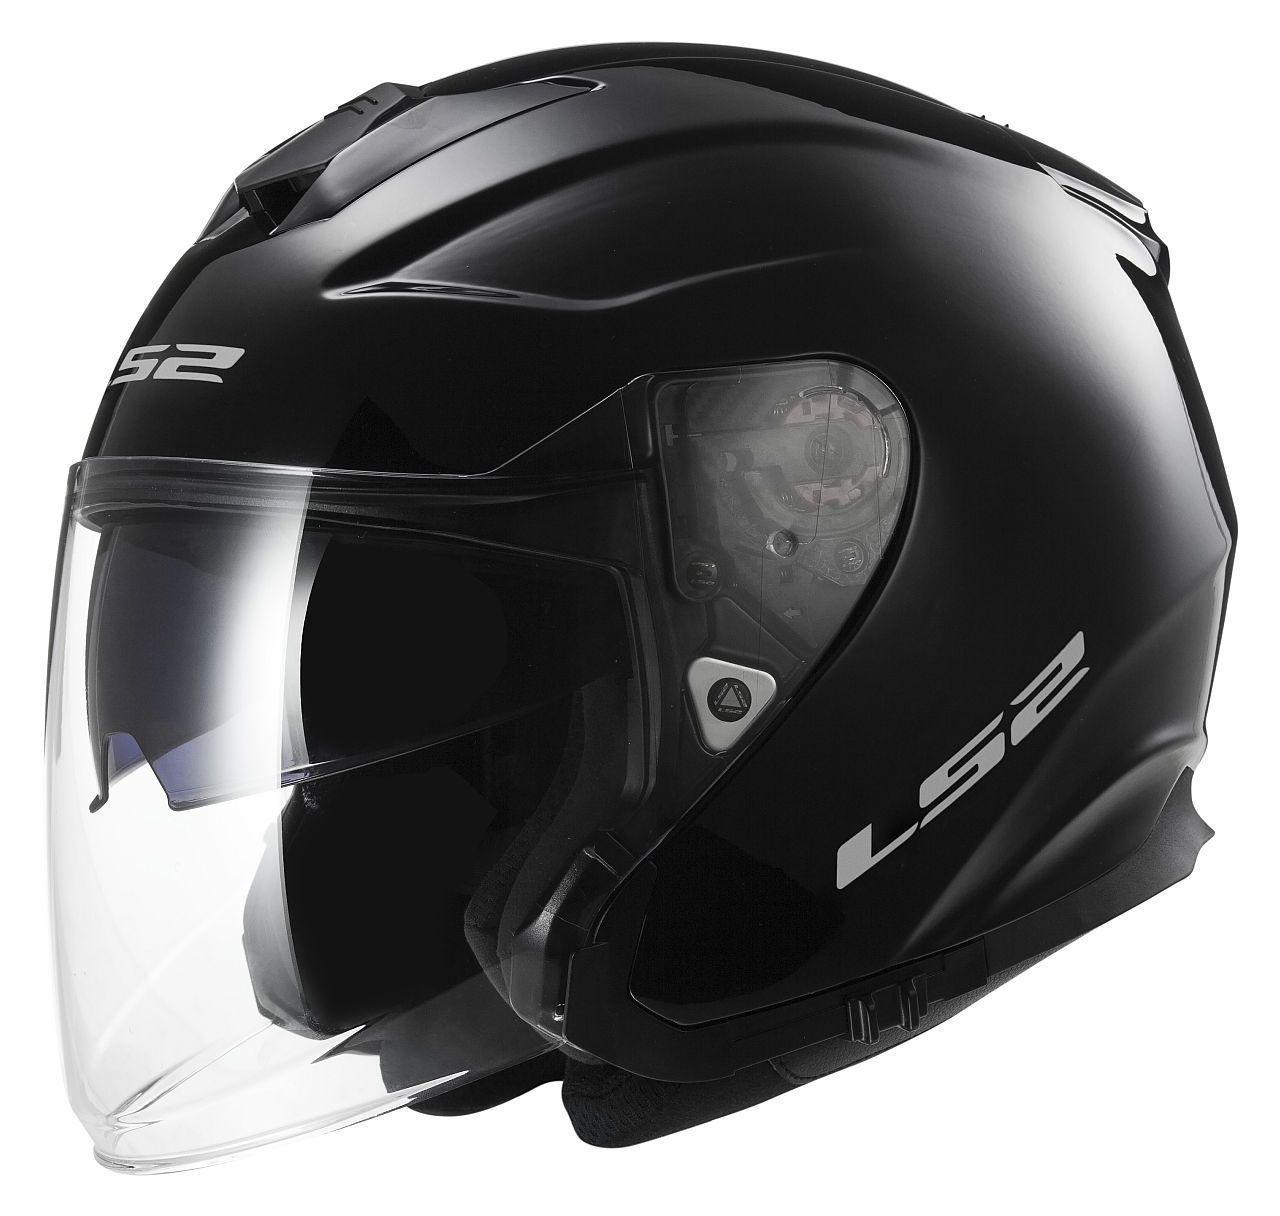 Womens Heated Clothing >> LS2 Infinity Helmet - Solid - RevZilla